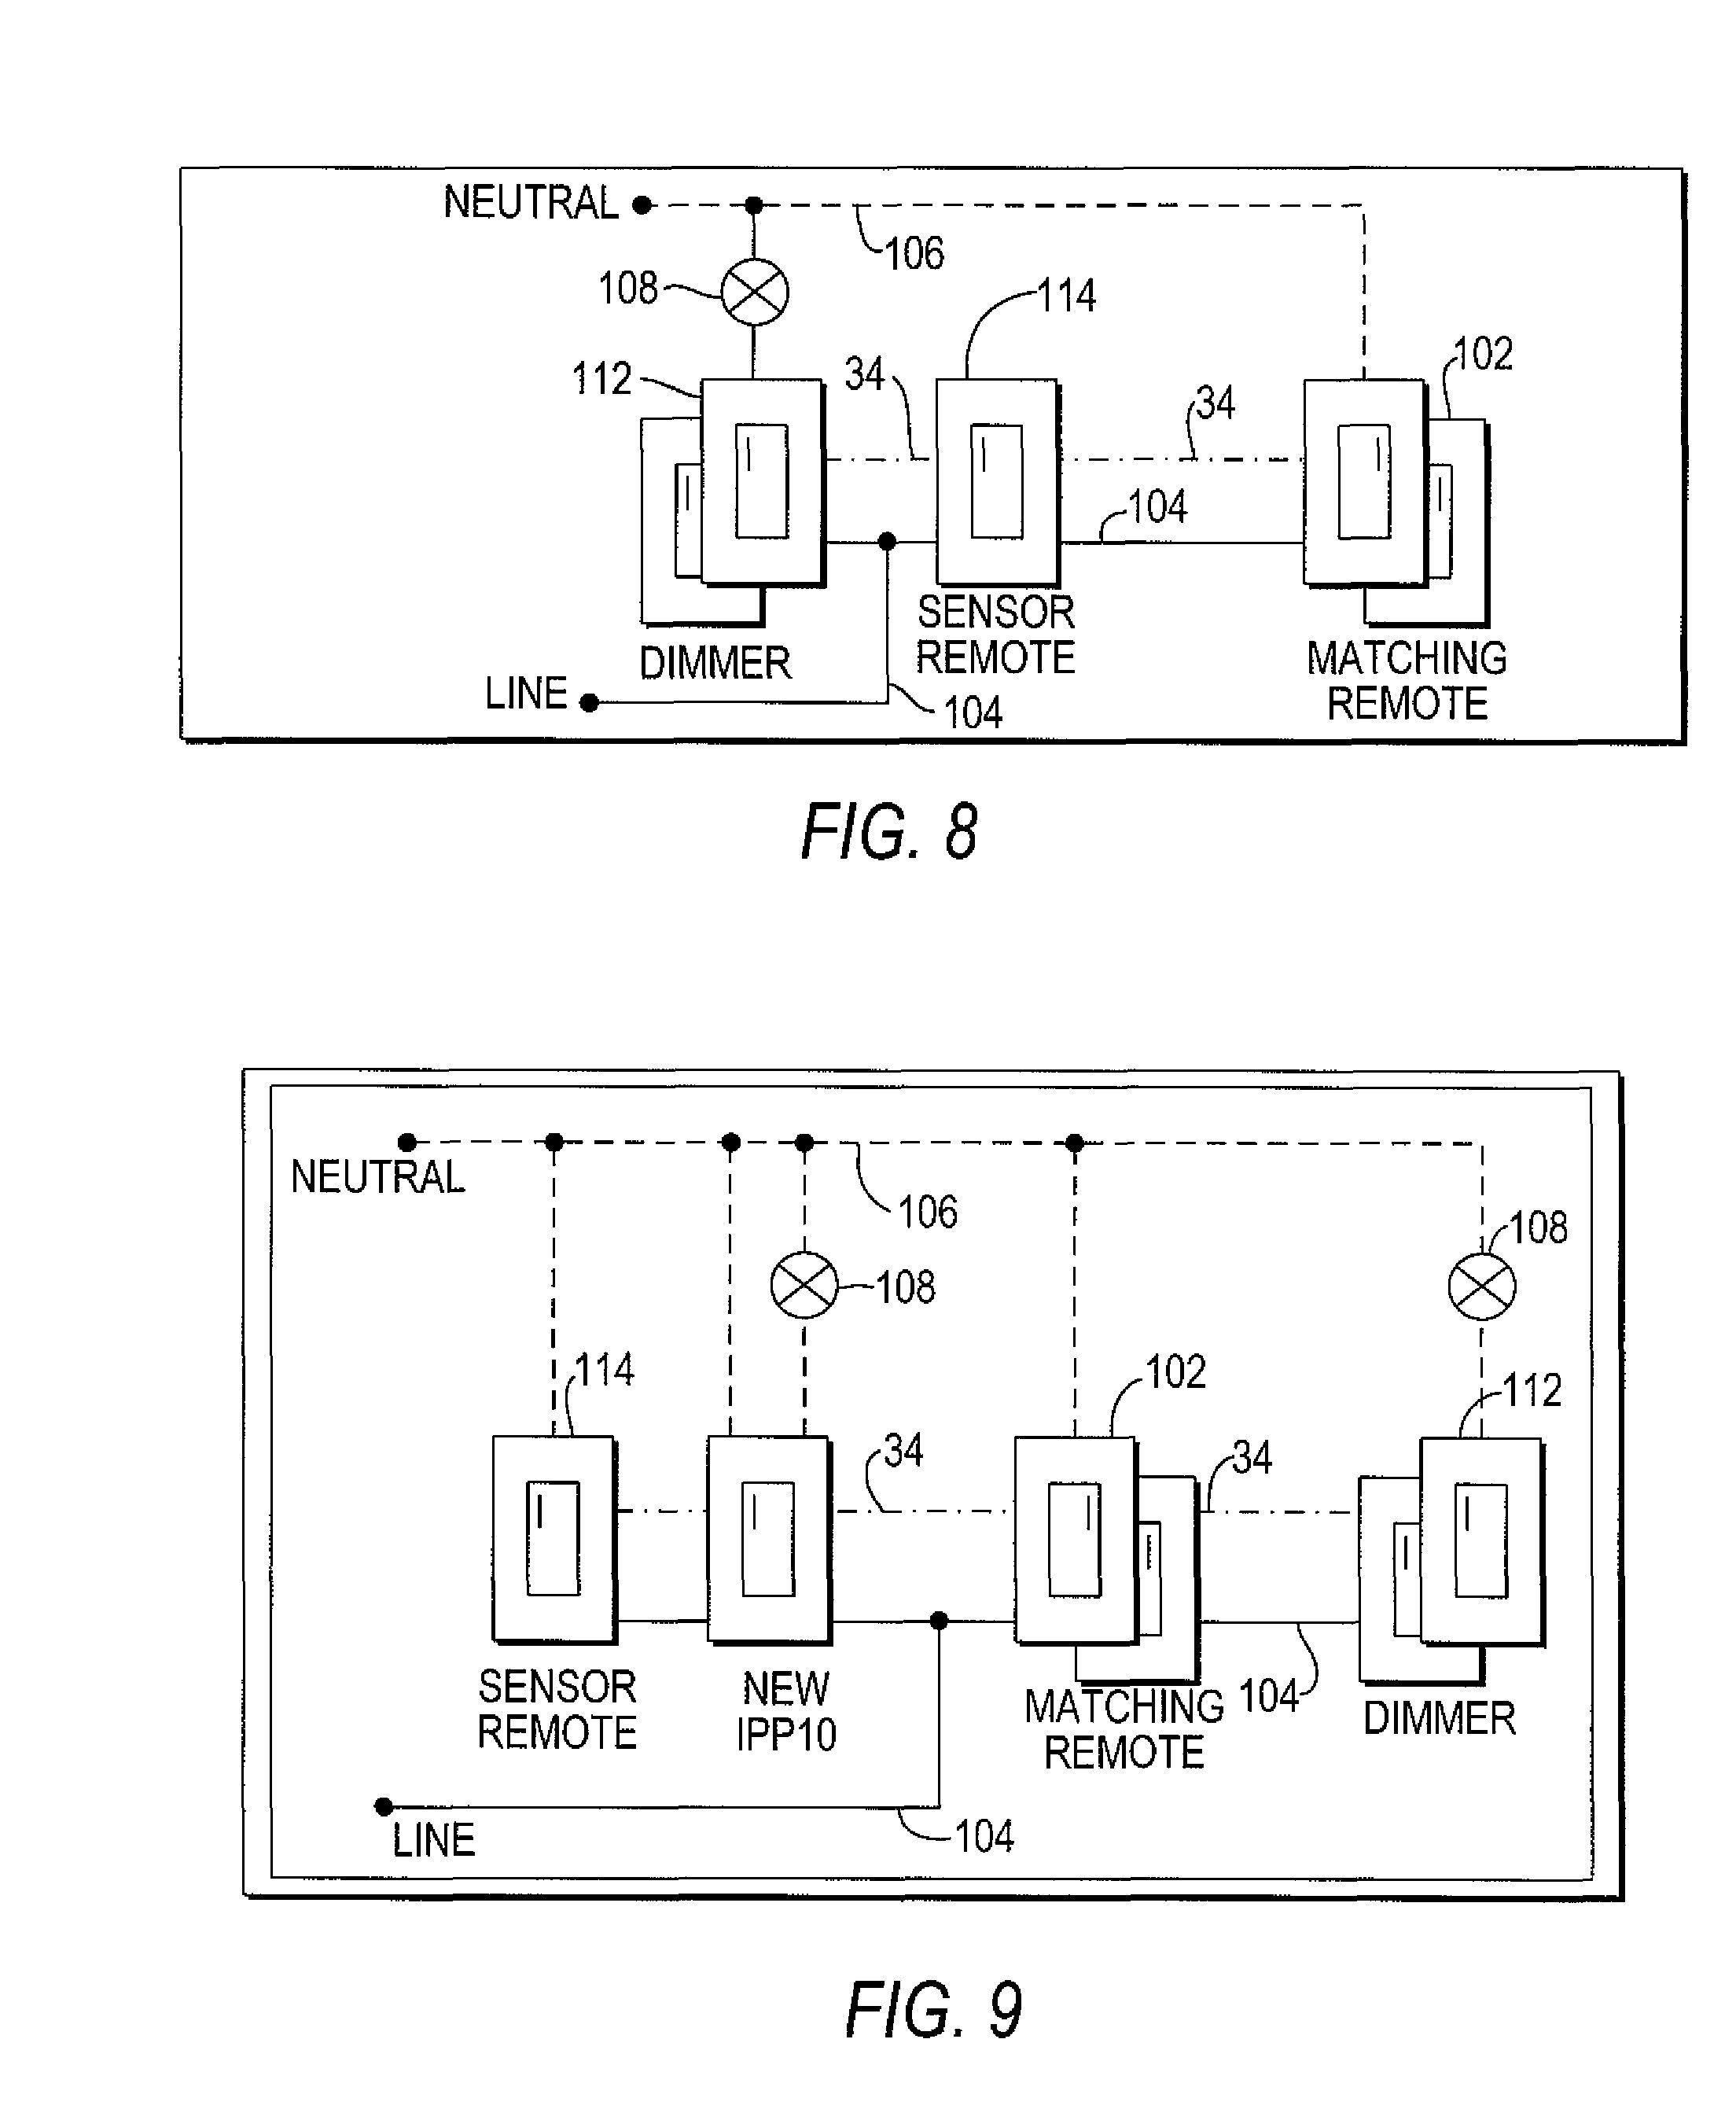 Elegant Lutron Occupancy Sensor Wiring Diagram In 2020 Dimmer Switch Diagram Dimmer